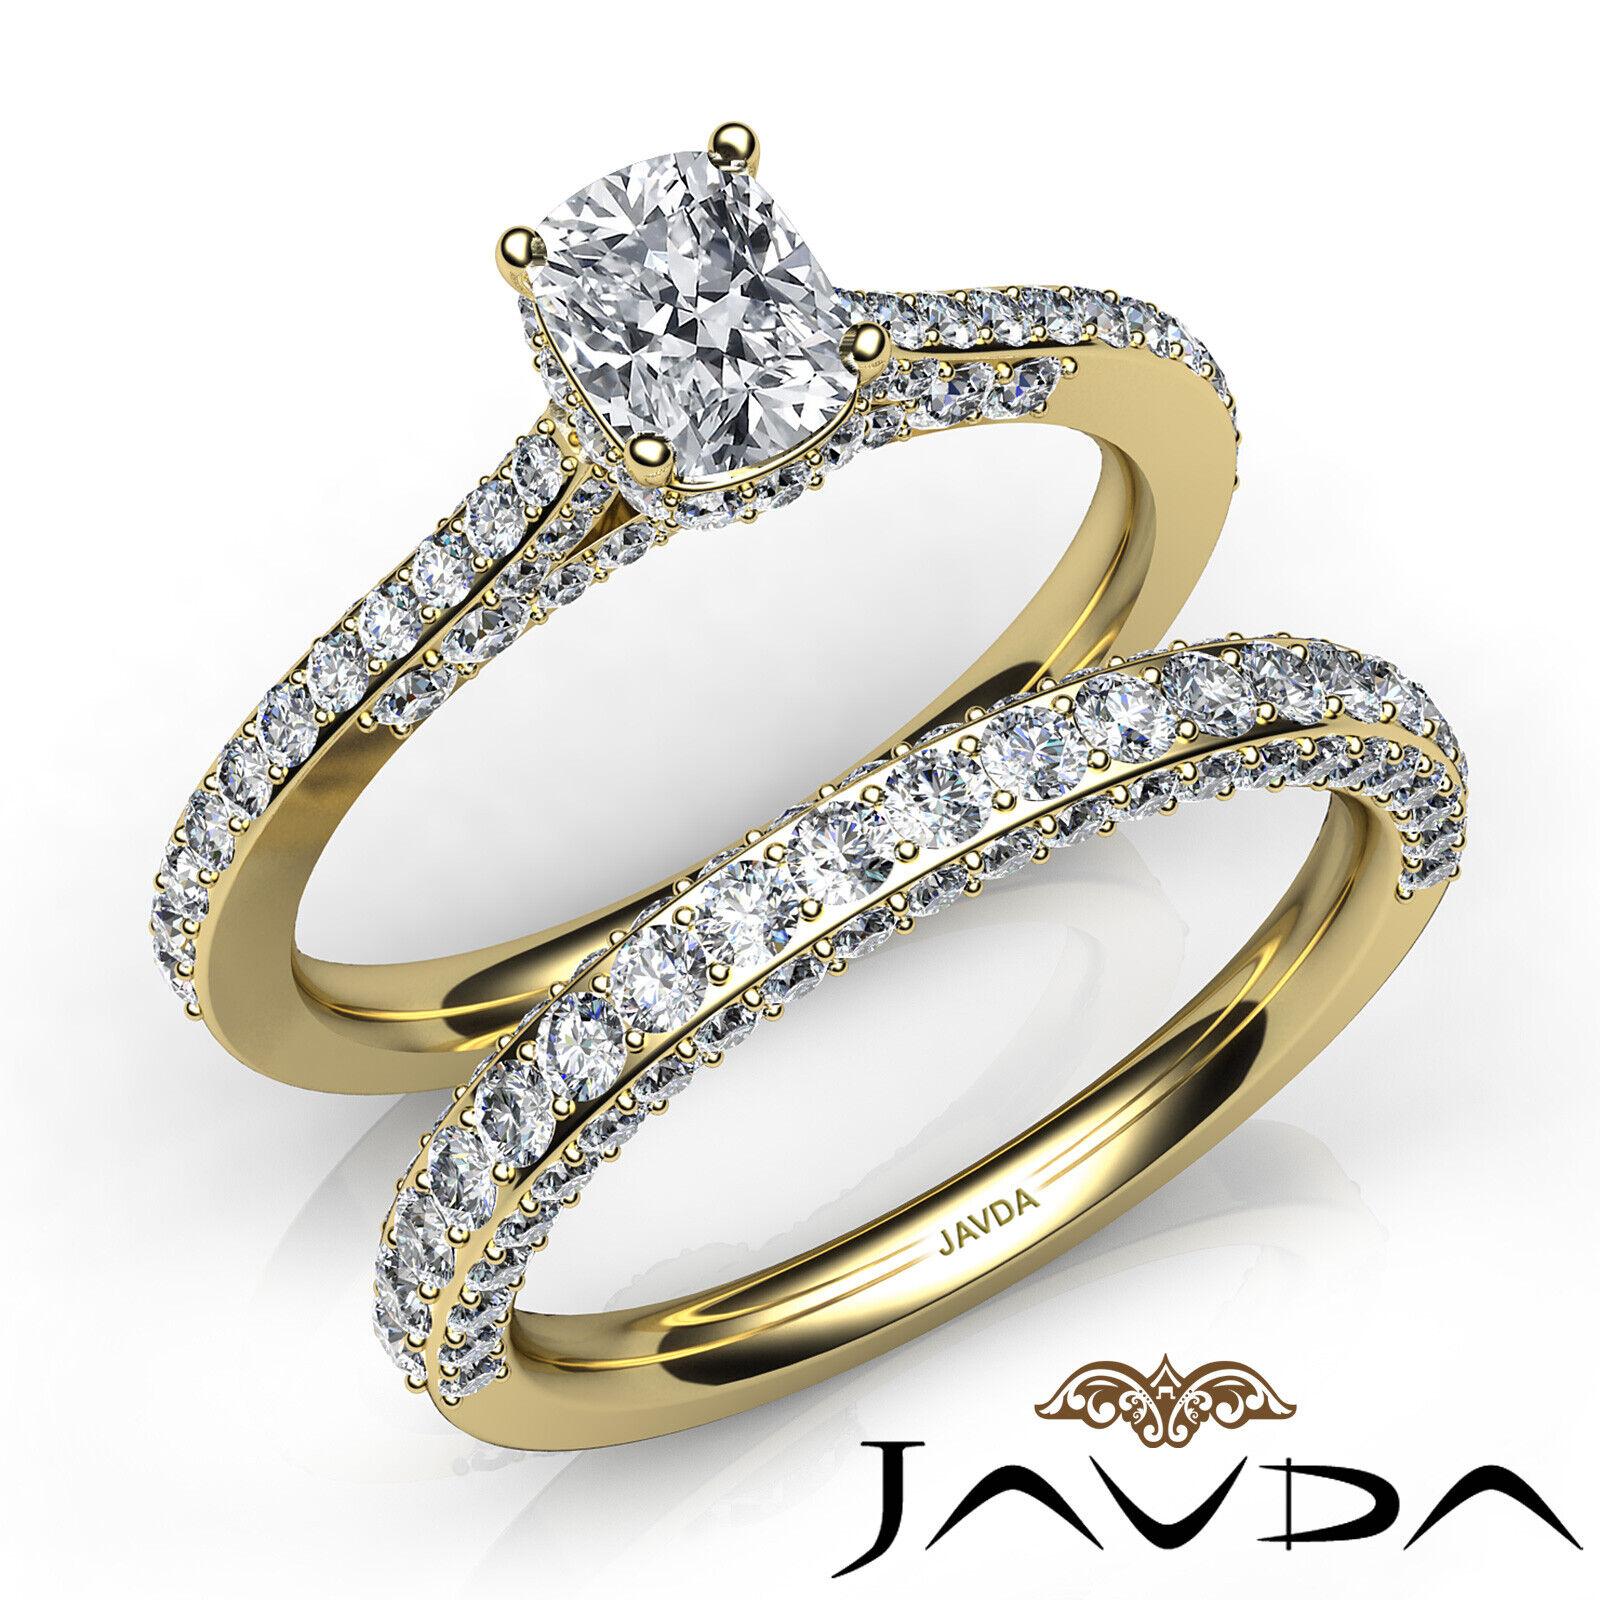 2.85ctw Pave Circa Halo Bridal Cushion Diamond Engagement Ring GIA F-VS1 W Gold 7